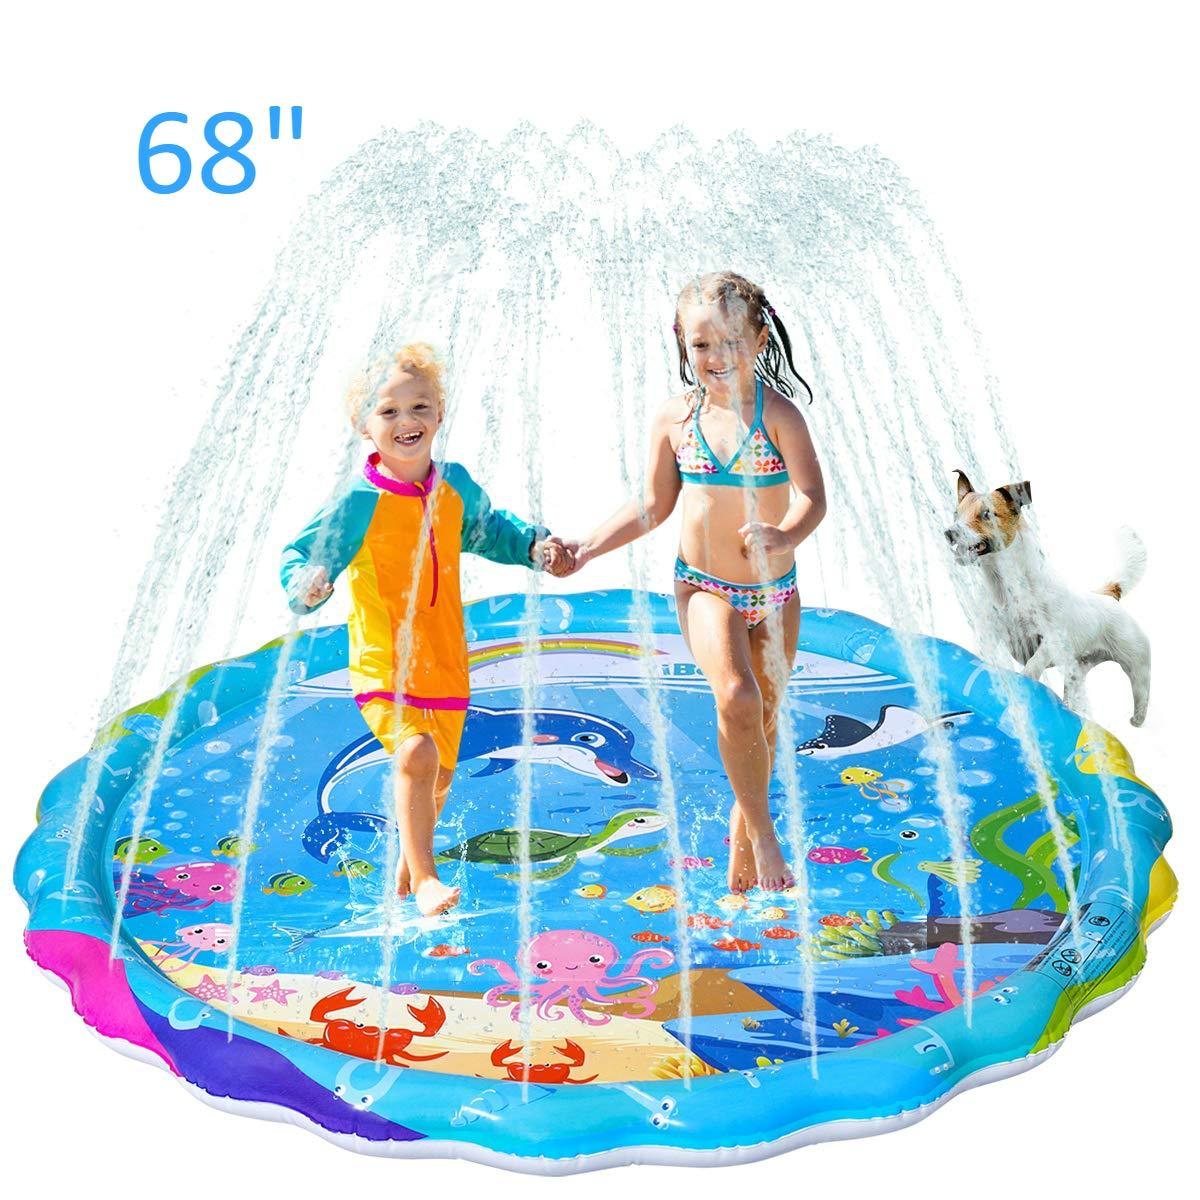 "iBaseToy Sprinkler for Kids, 68"" Inflatable Splash Pad Sprinkler for Toddlers Dogs, Sprinkle and Splash Play Mat, Sprinkler Water Toys for Outdoor Play, Fun Backyard Fountain Play Mat for Girls Boys"